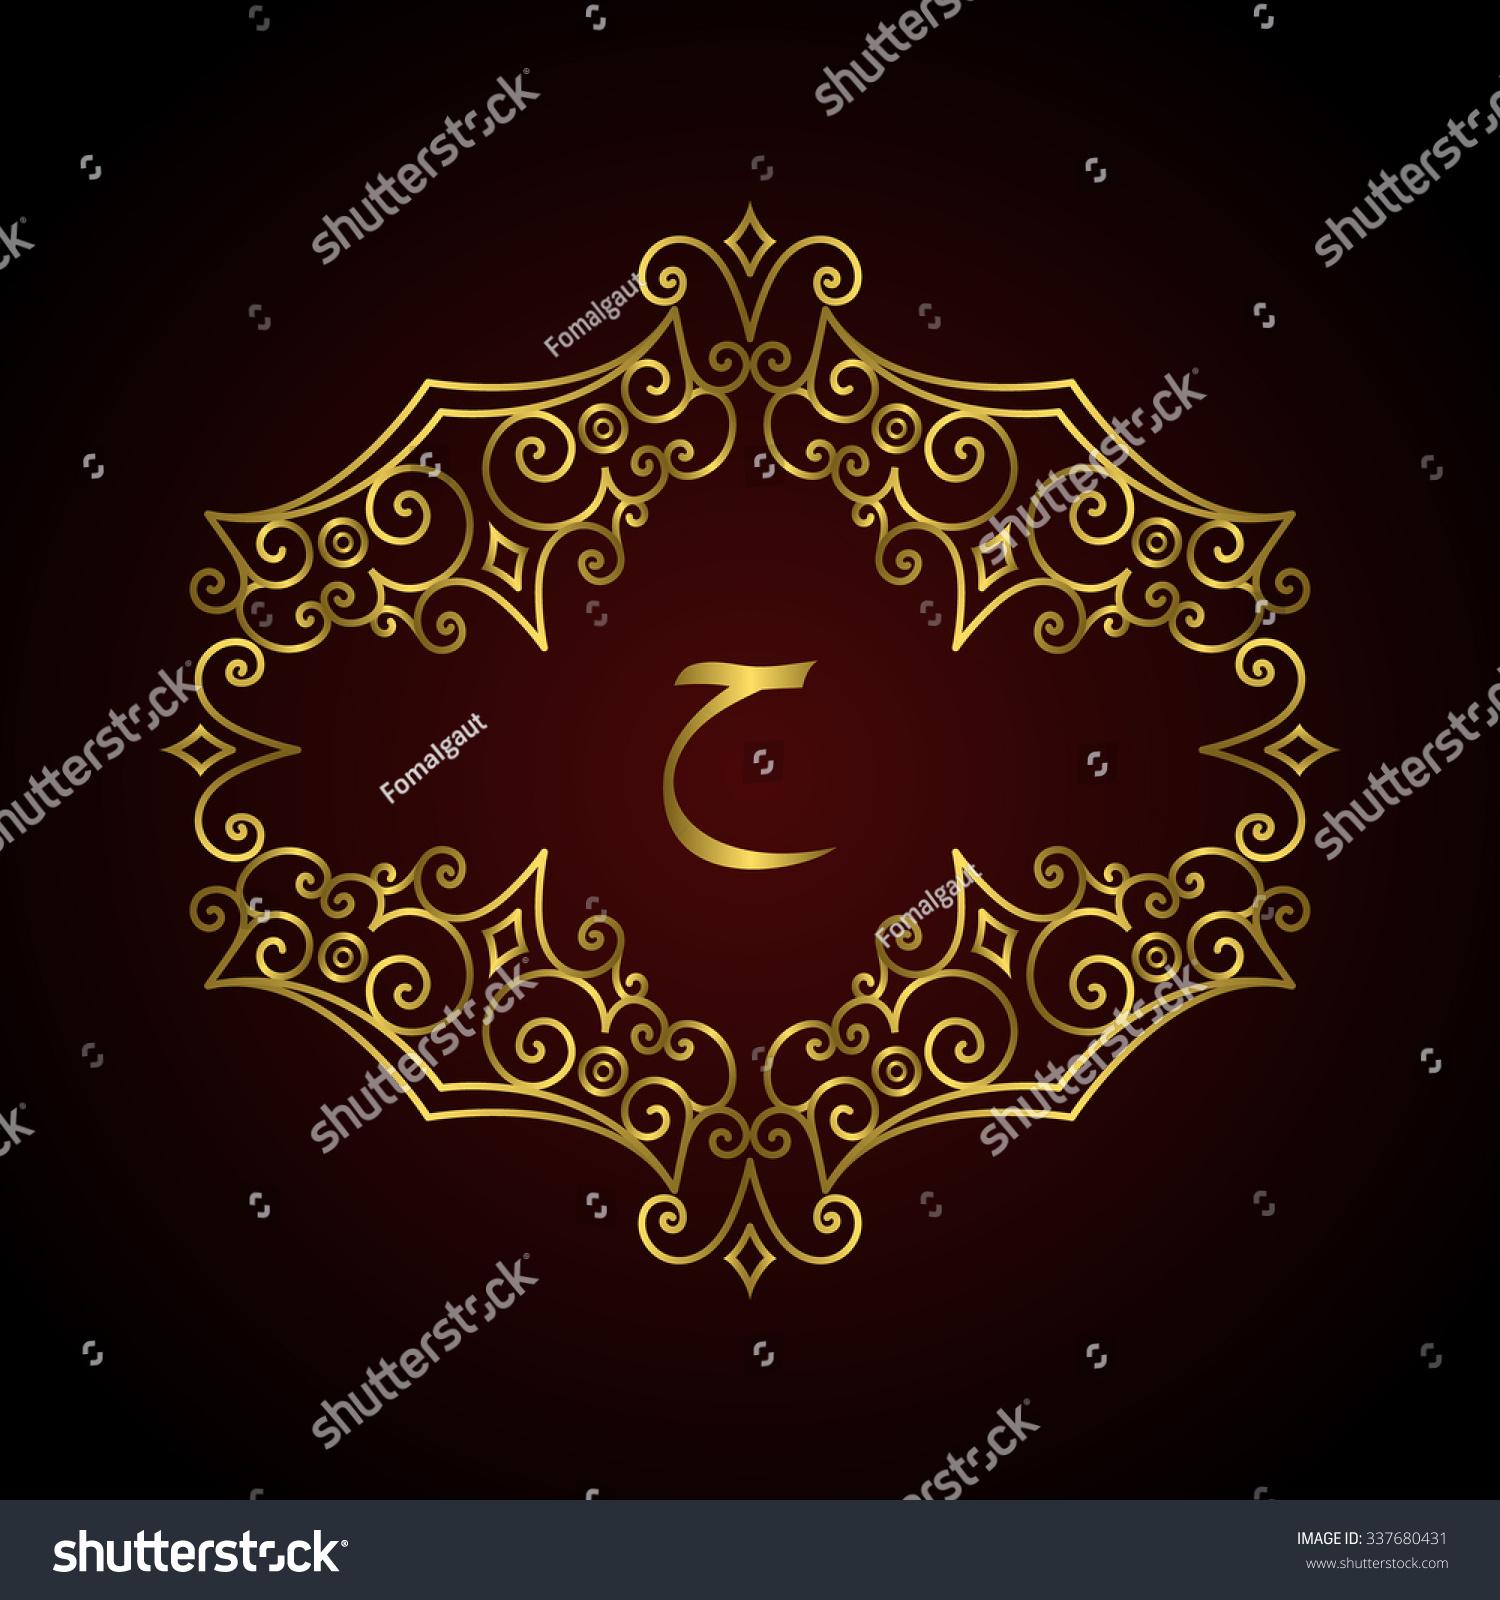 Arabic Symbol Letter H Calligraphic Monogram Stock Vector Royalty Free 337680431